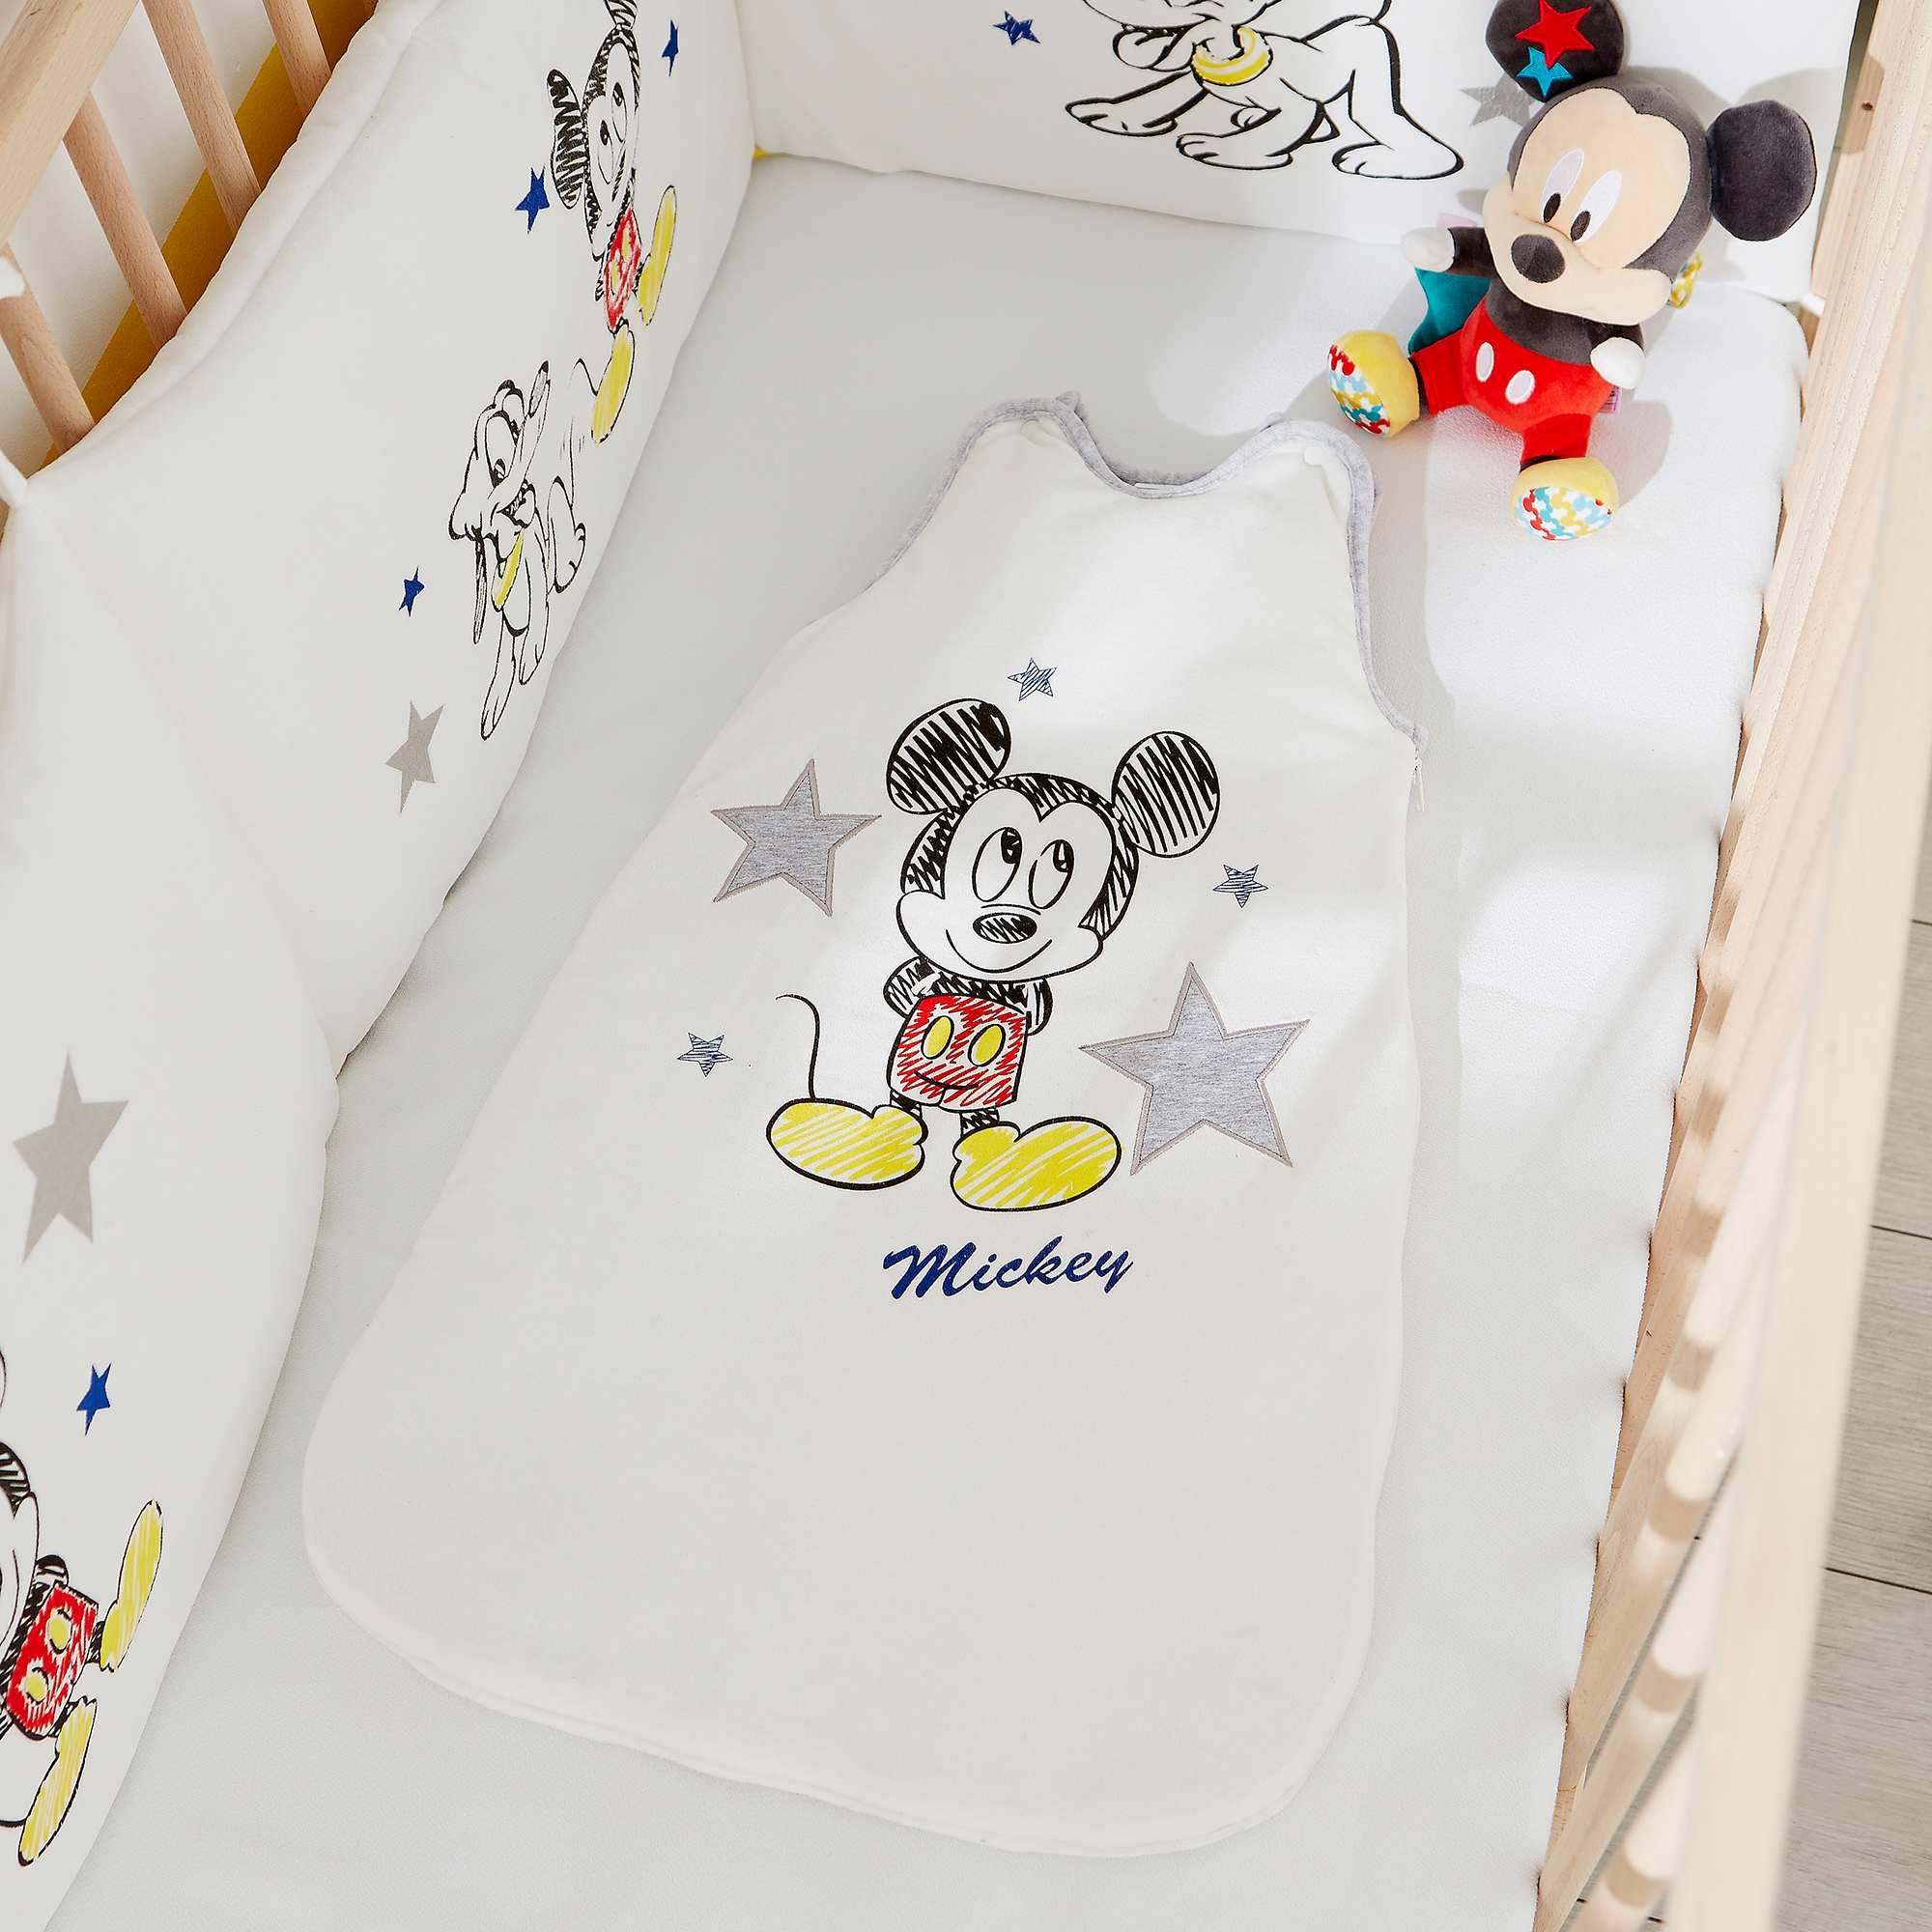 Couleur : Mickey, , ,, - Taille : 0/6M, 6/24M, ,,Au dodo avec 'Mickey' ! - Gigoteuse 'Disney' chaude en velours - TOG 4 - Doublure